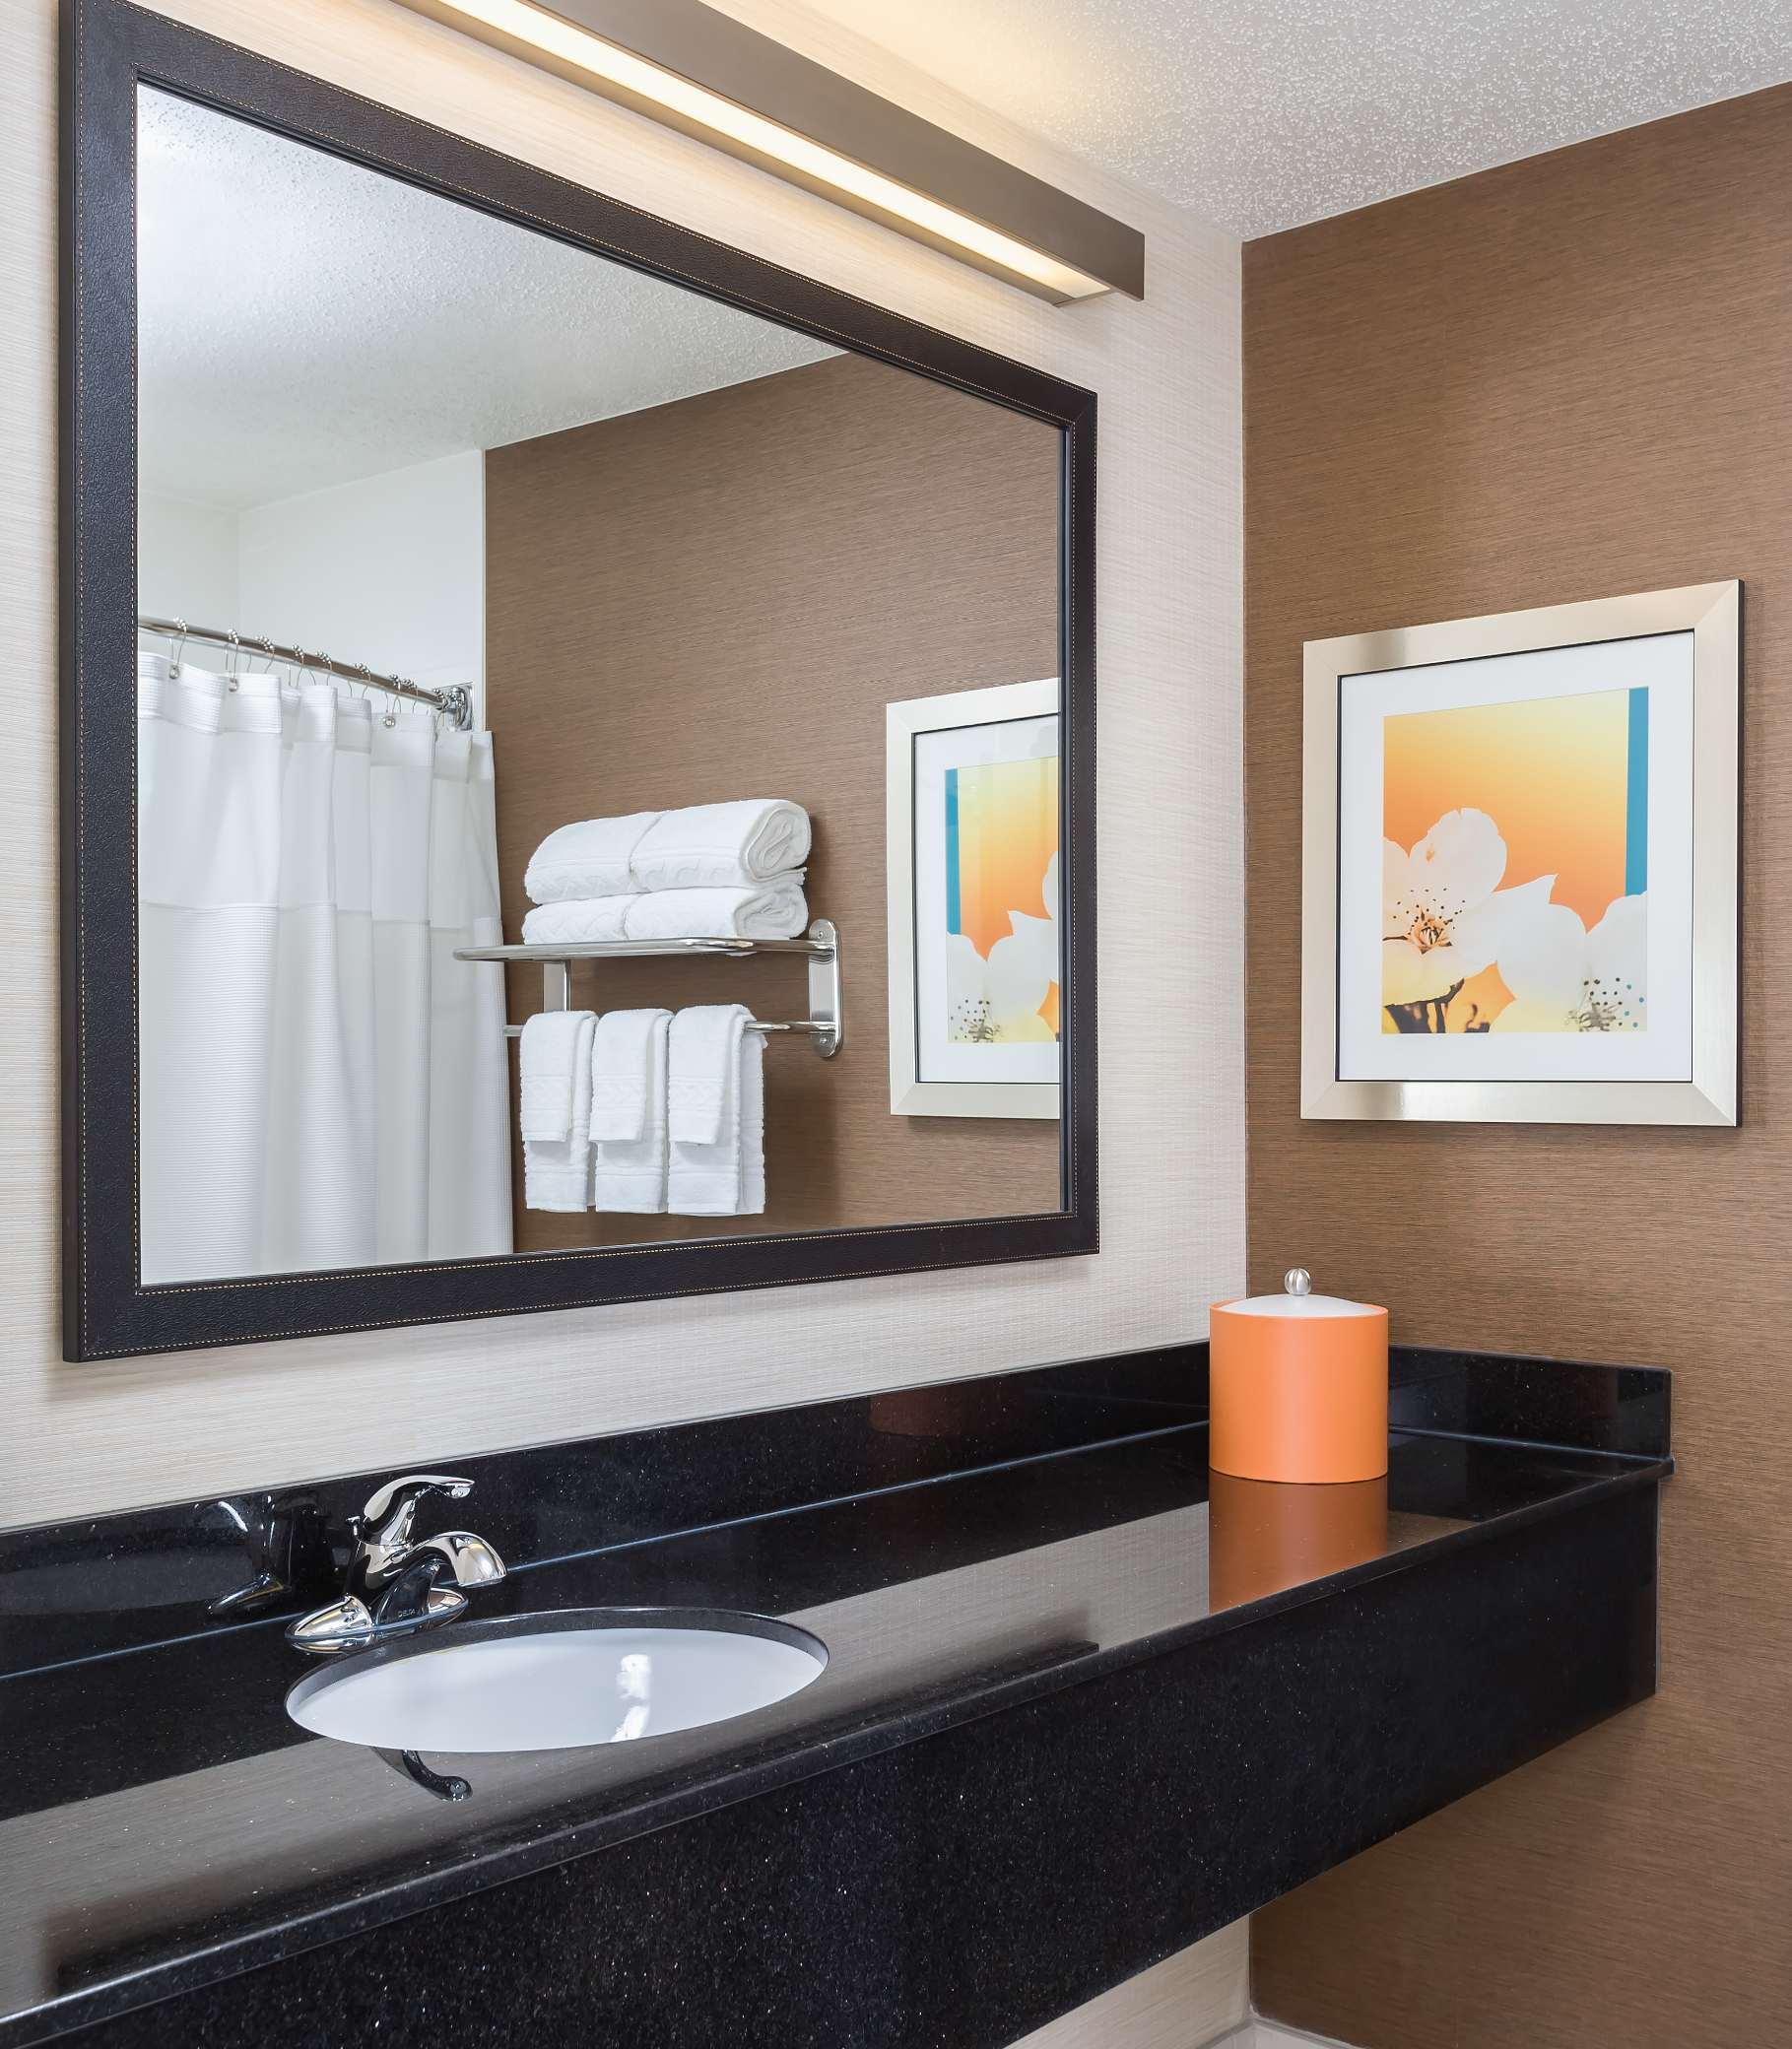 Fairfield Inn & Suites by Marriott Lafayette image 13